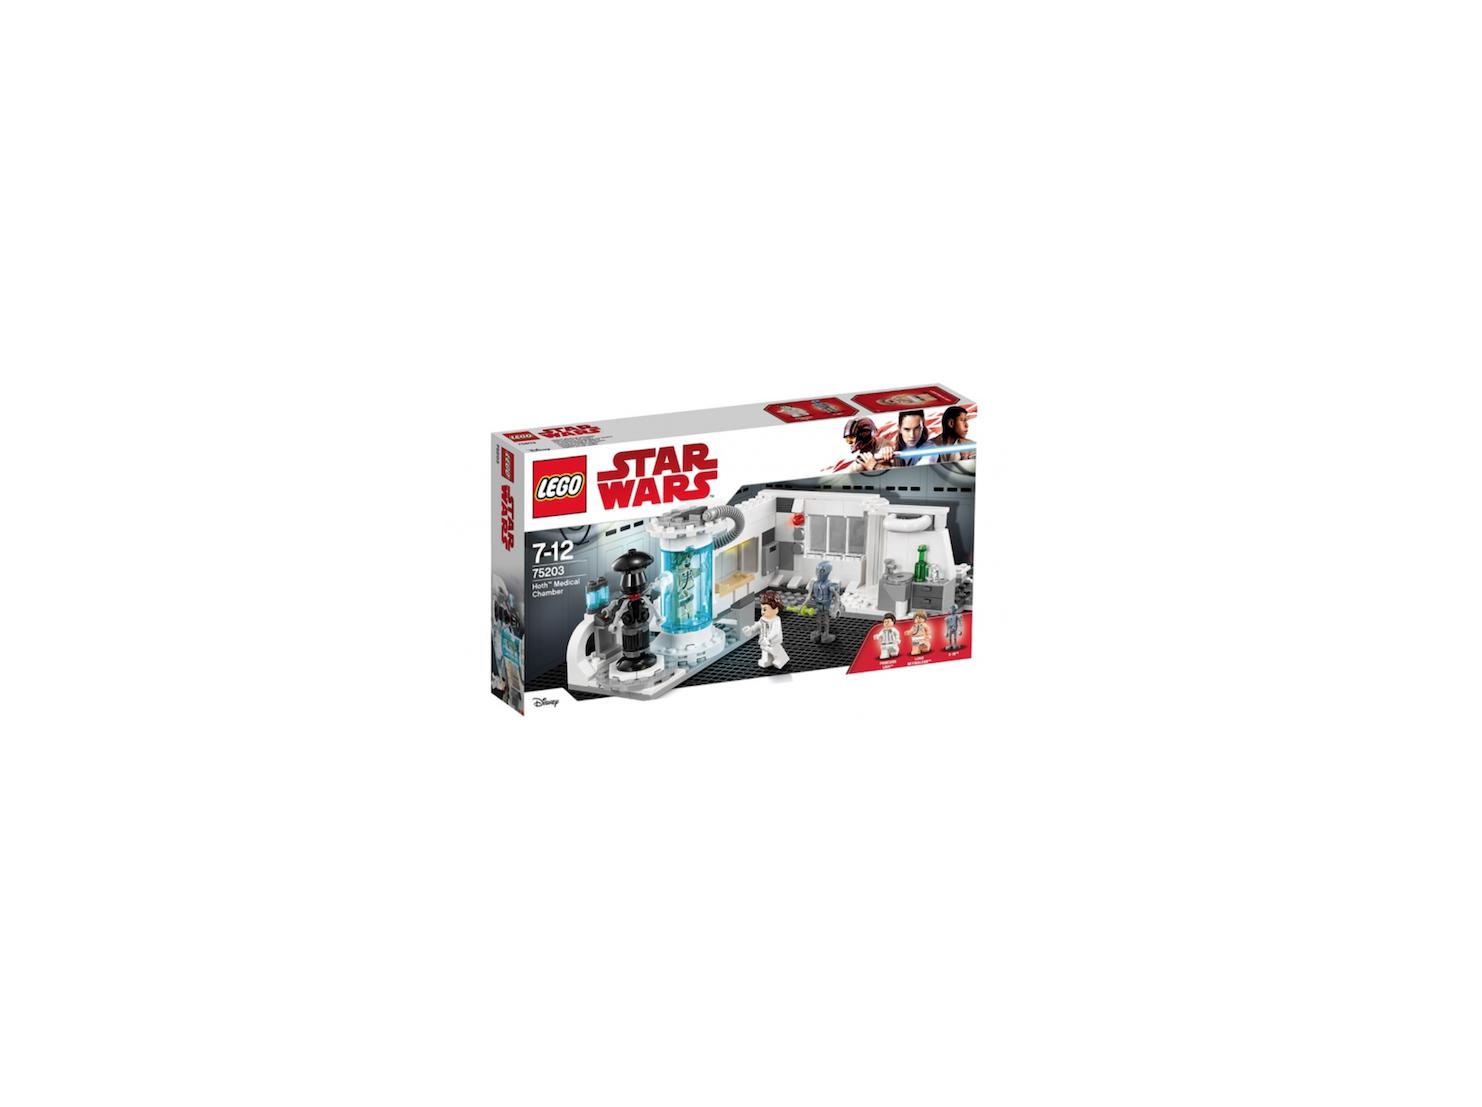 LEGO STAR WARS HOTH MEDICAL CHAMBER ITEM 6212759  JOUET JEU JEUX CONSTRUCTION ENFANT NOEL NEUF 5702016110616 COMASOUND KARTEL 75203 CSK ONLINE